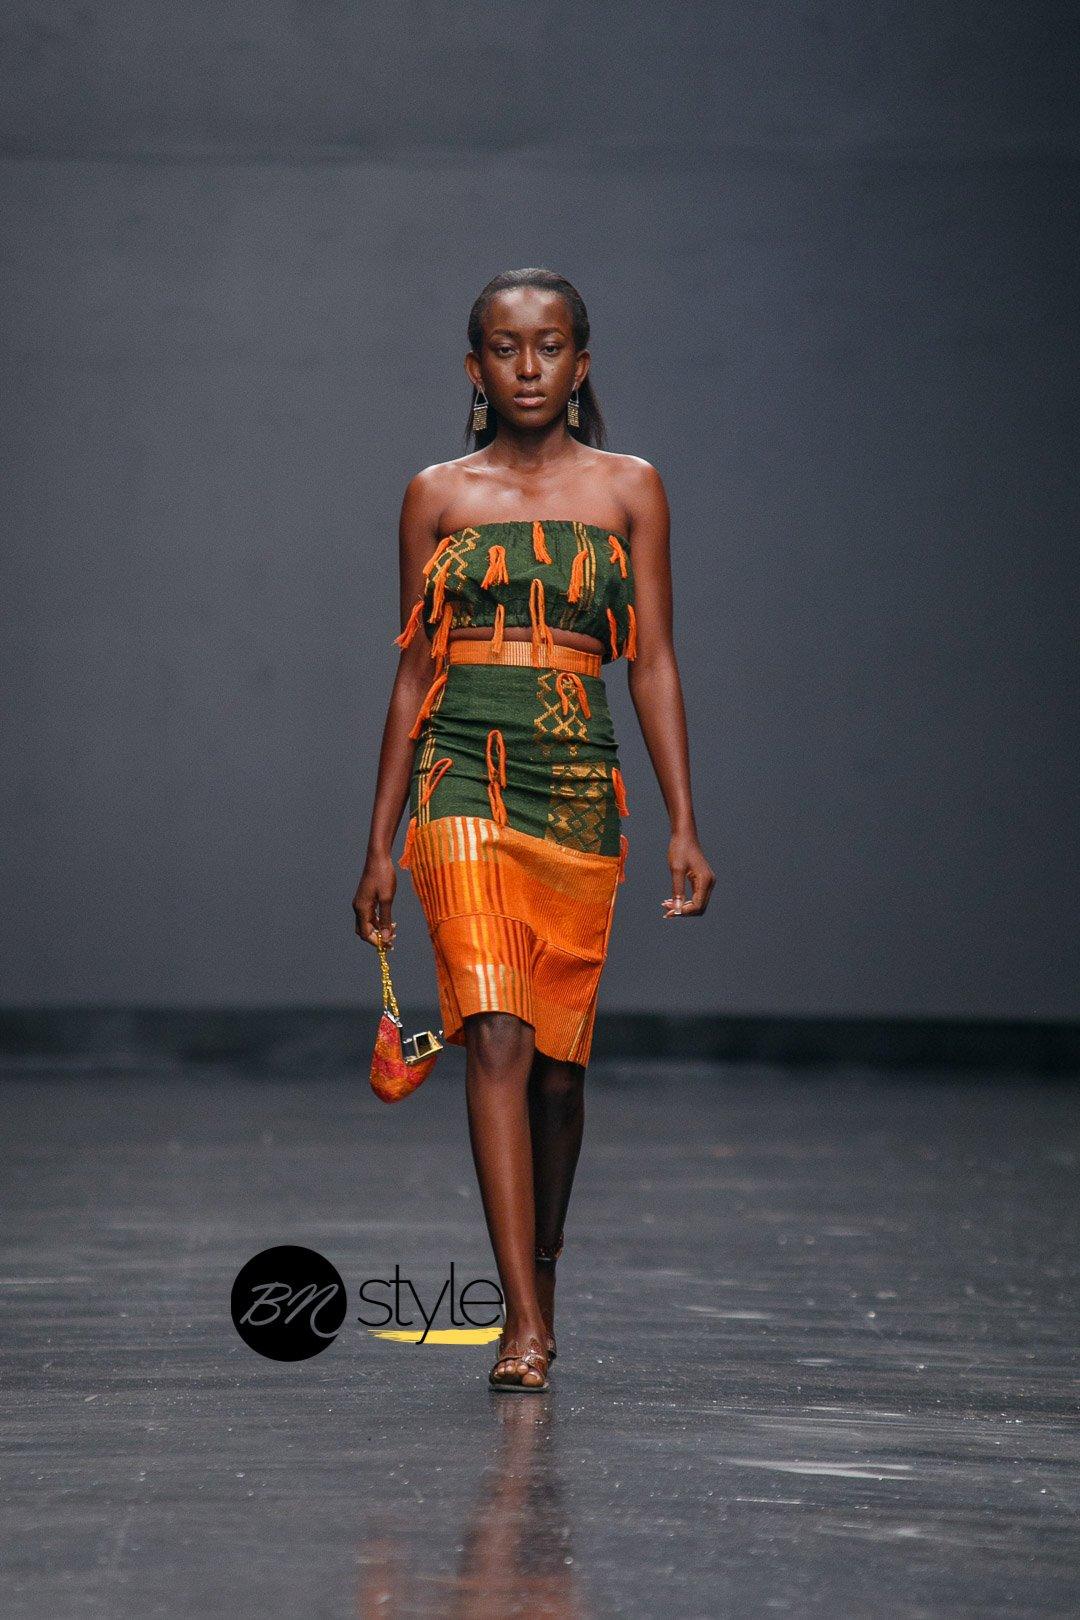 Lagos Fashion Week 2018 | Fayrouz Presents: Green Access